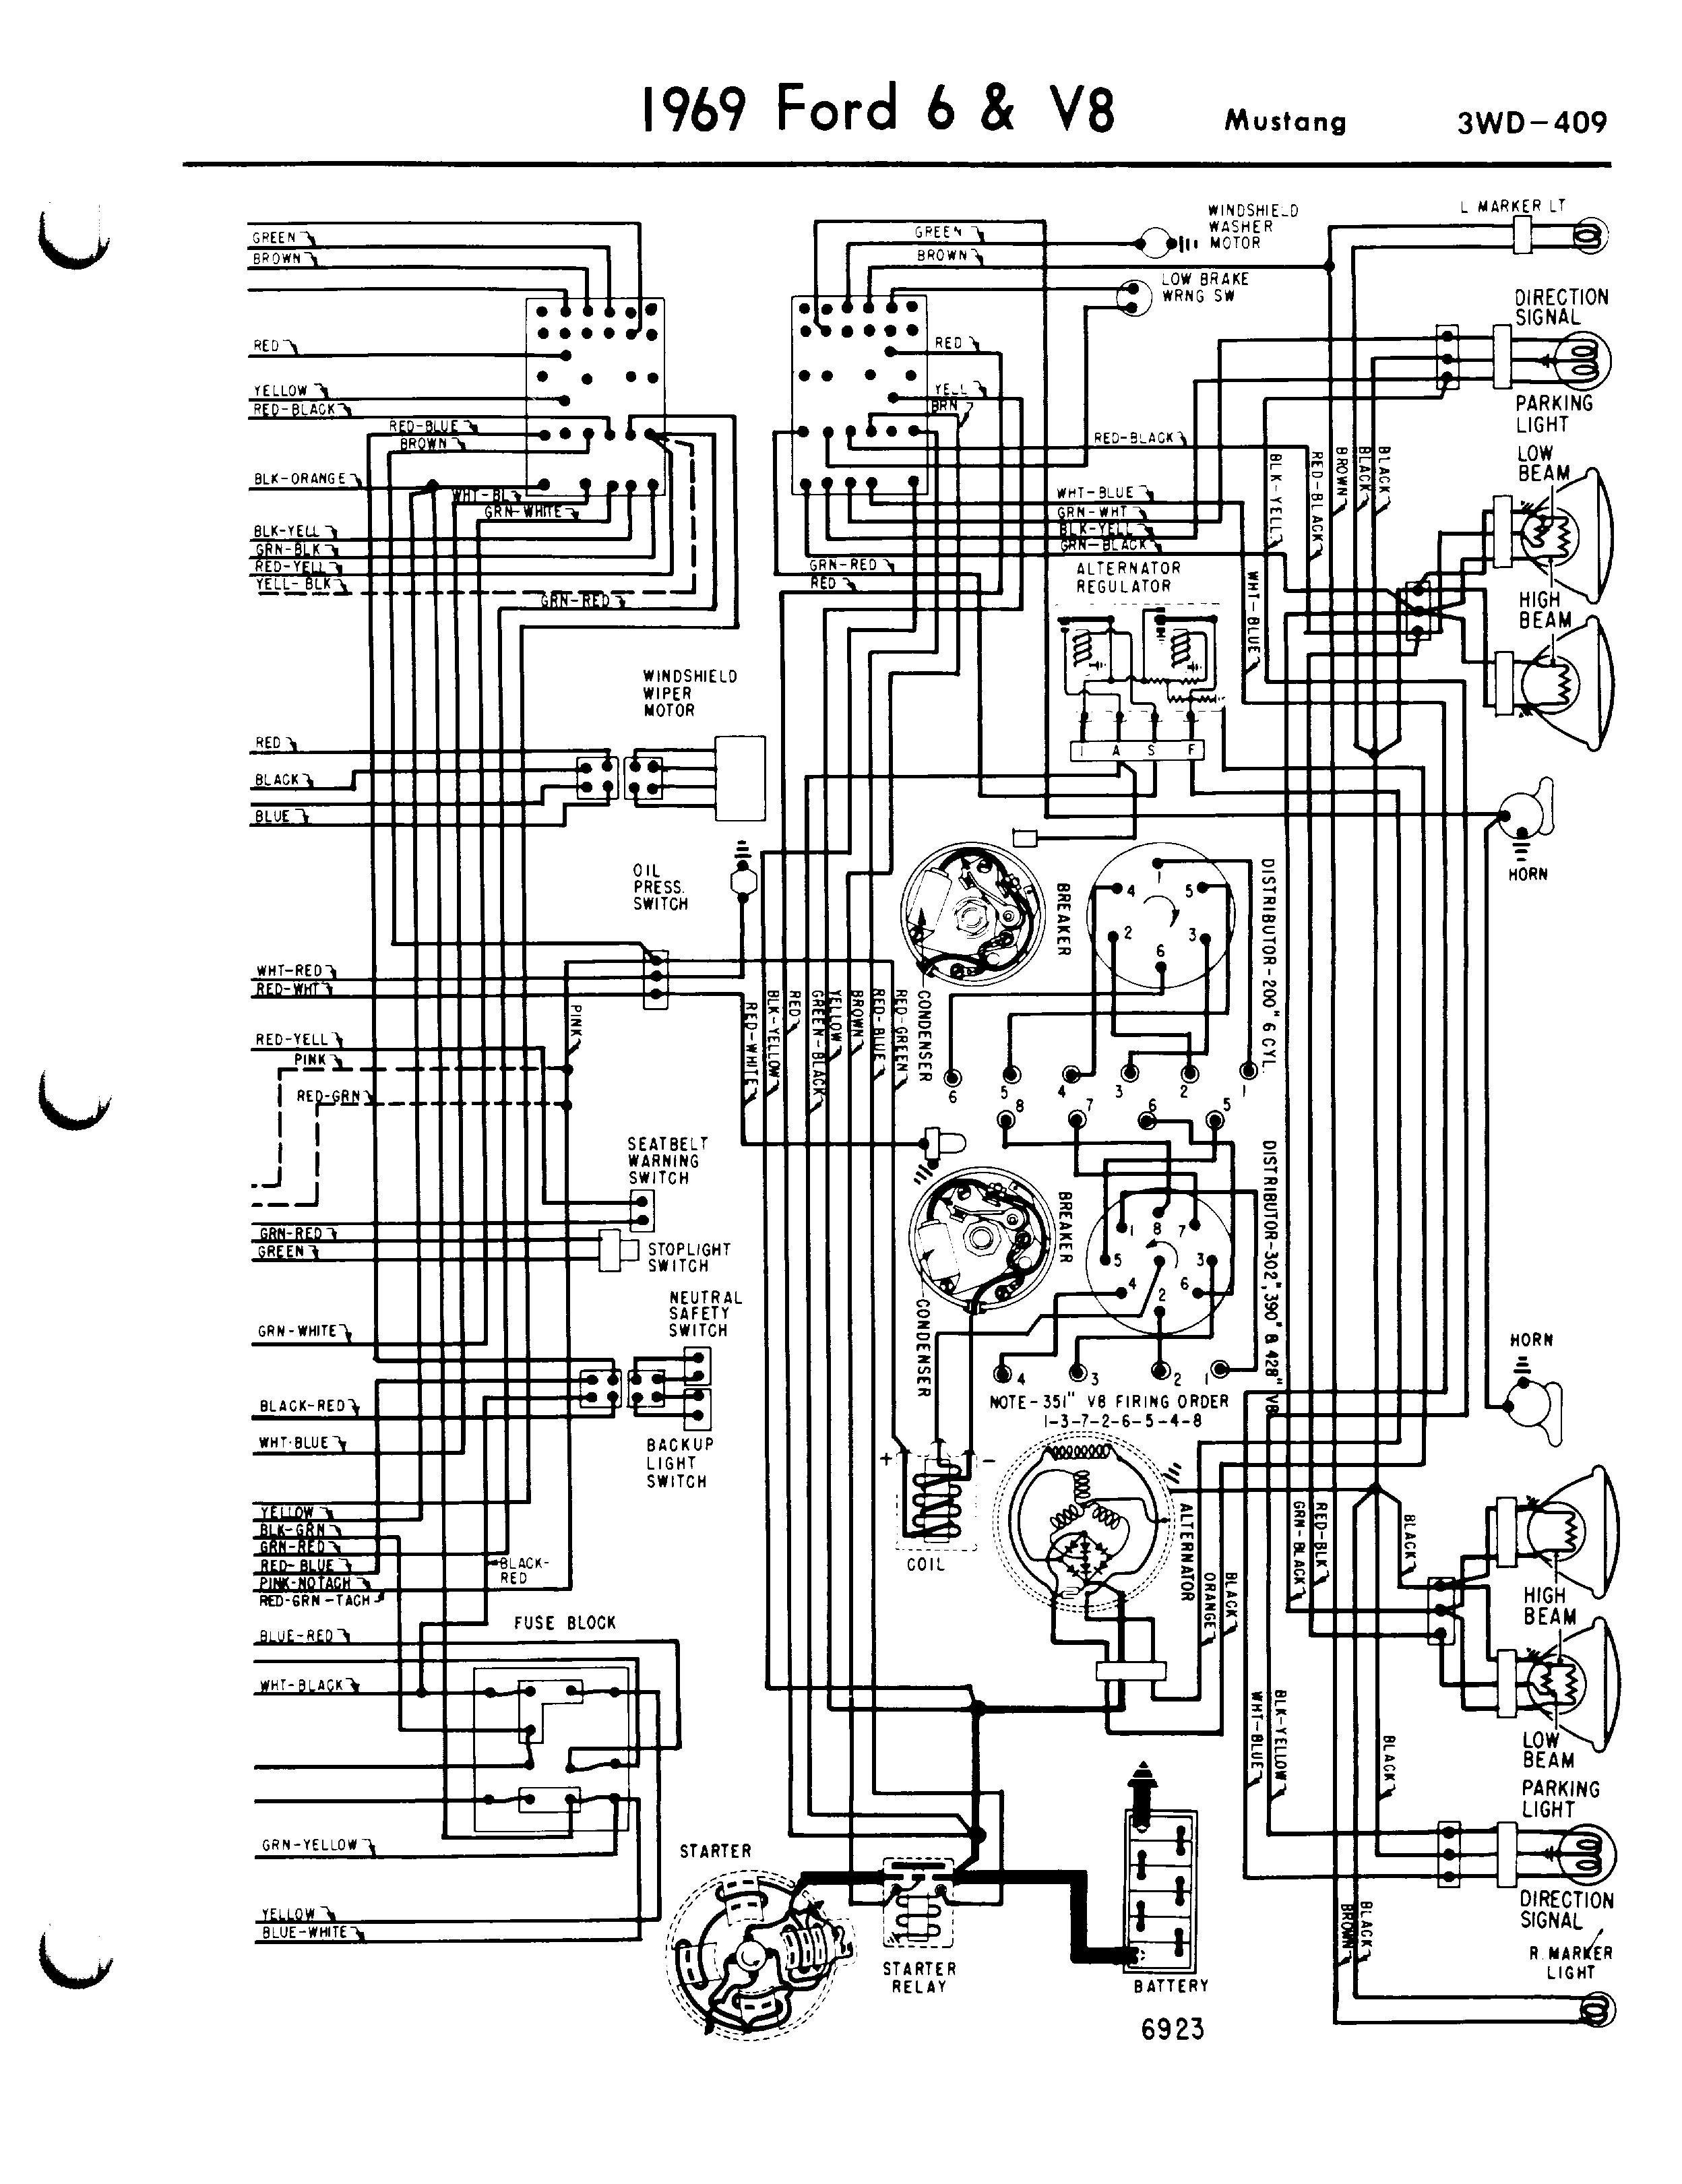 1969 ford mustang radio wiring